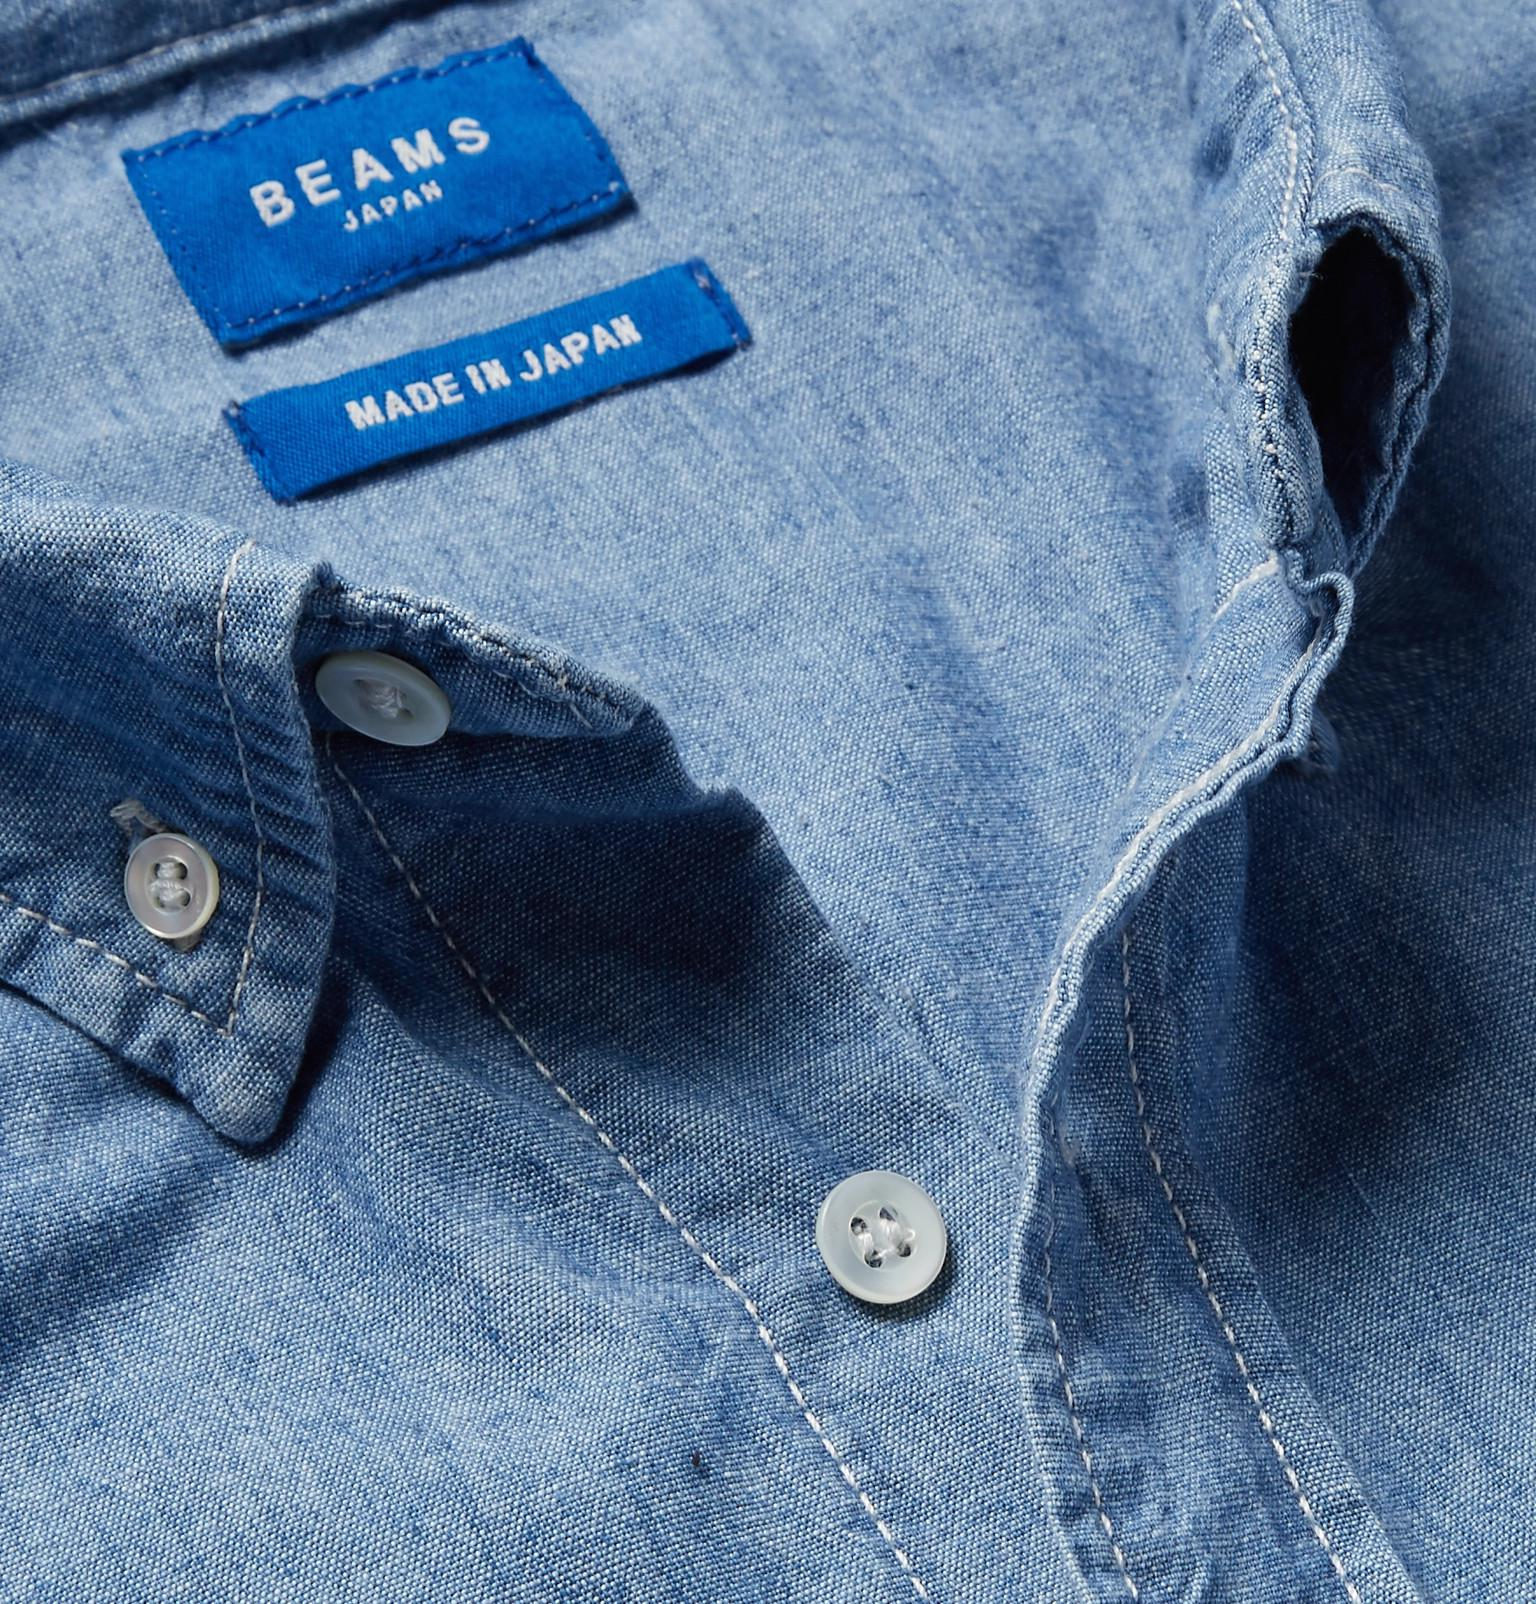 ef121cc0b3d Lyst - Beams Plus Button-down Collar Indigo-dyed Cotton-chambray ...